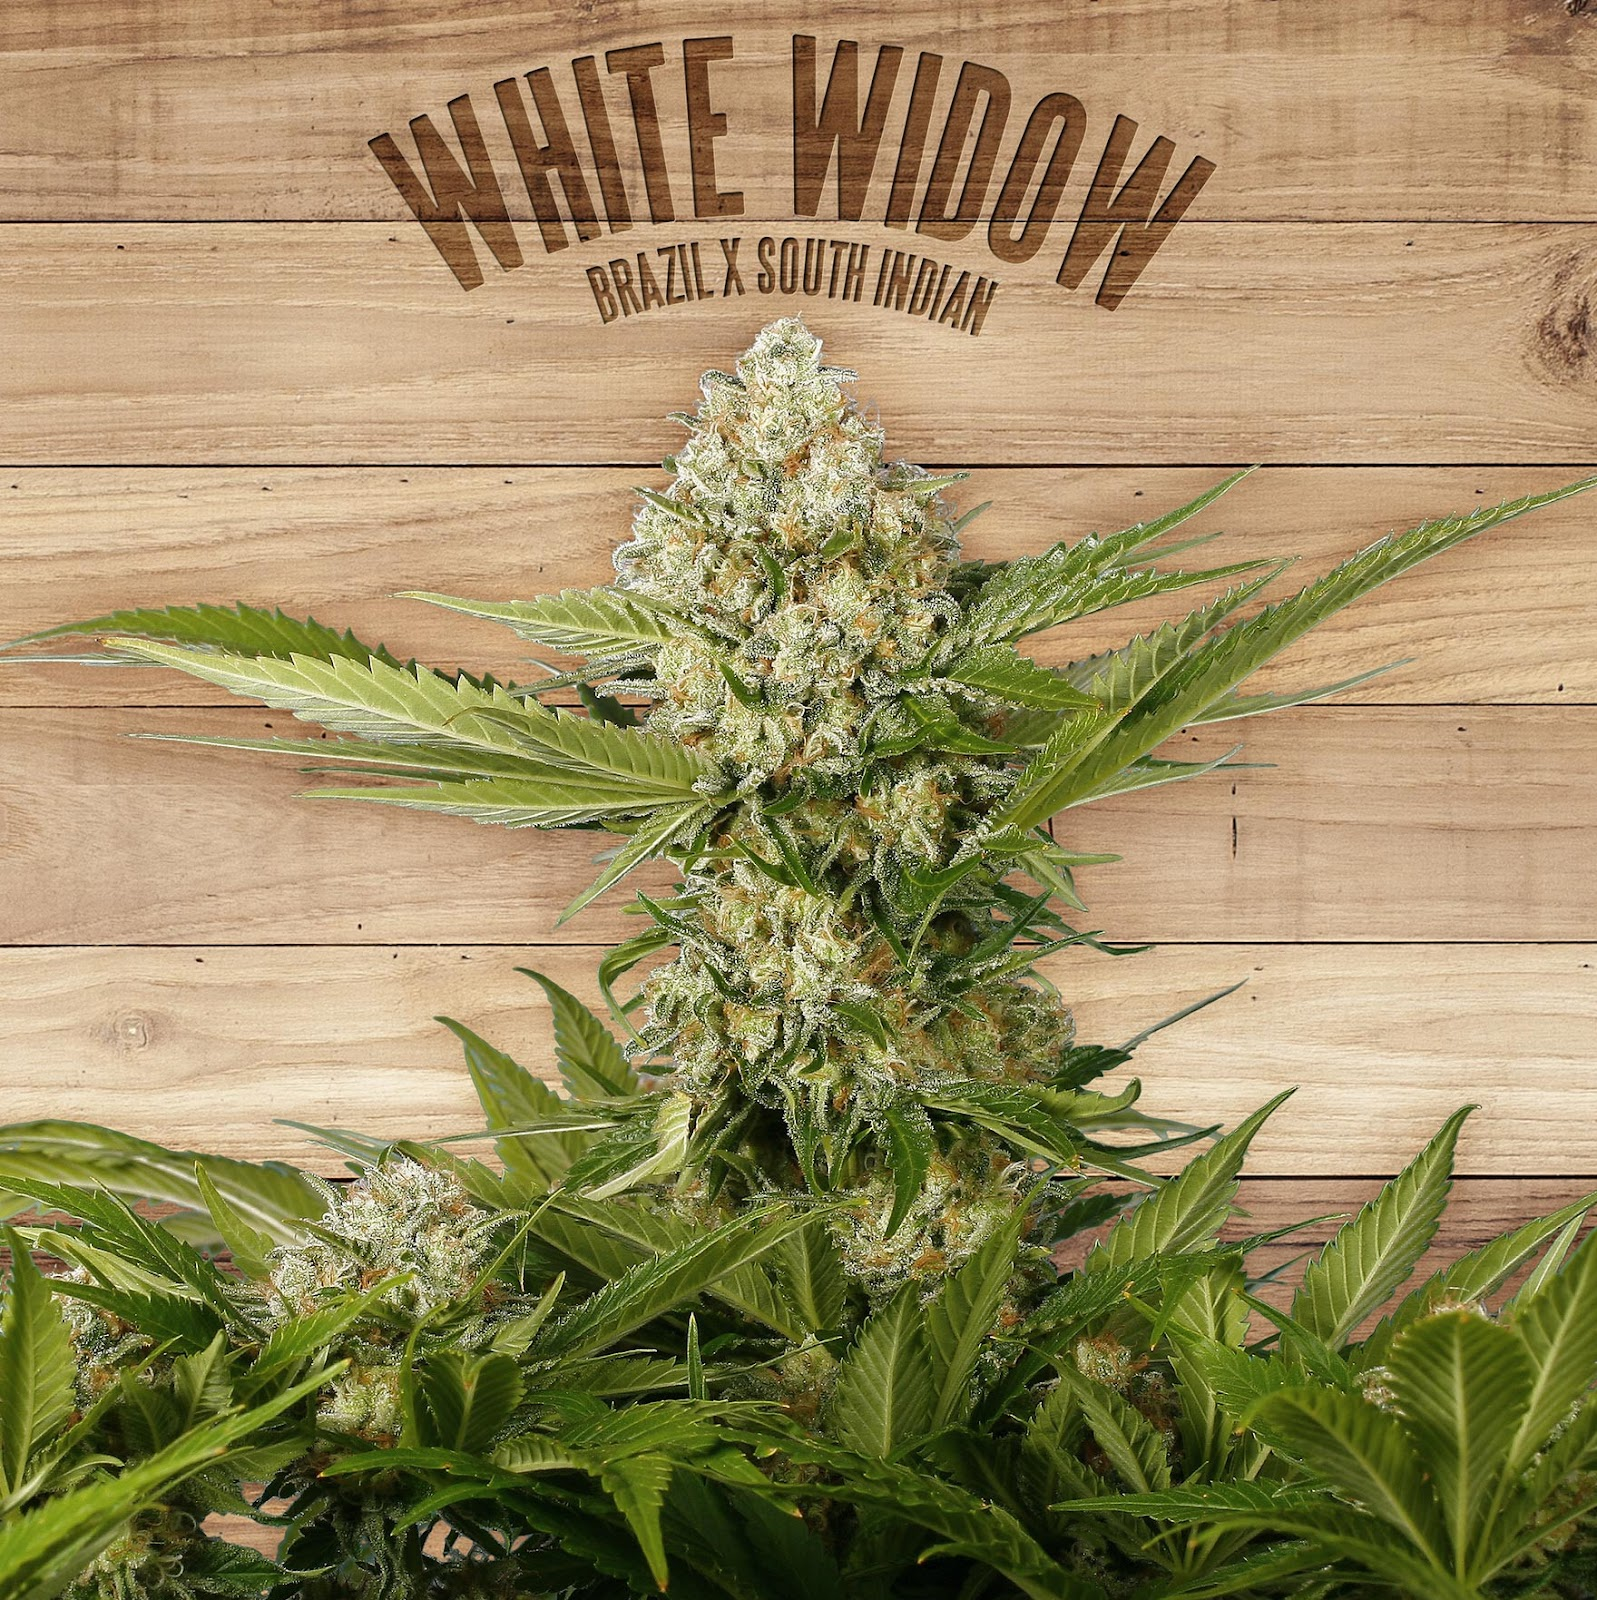 White Widow Branded Cannabis